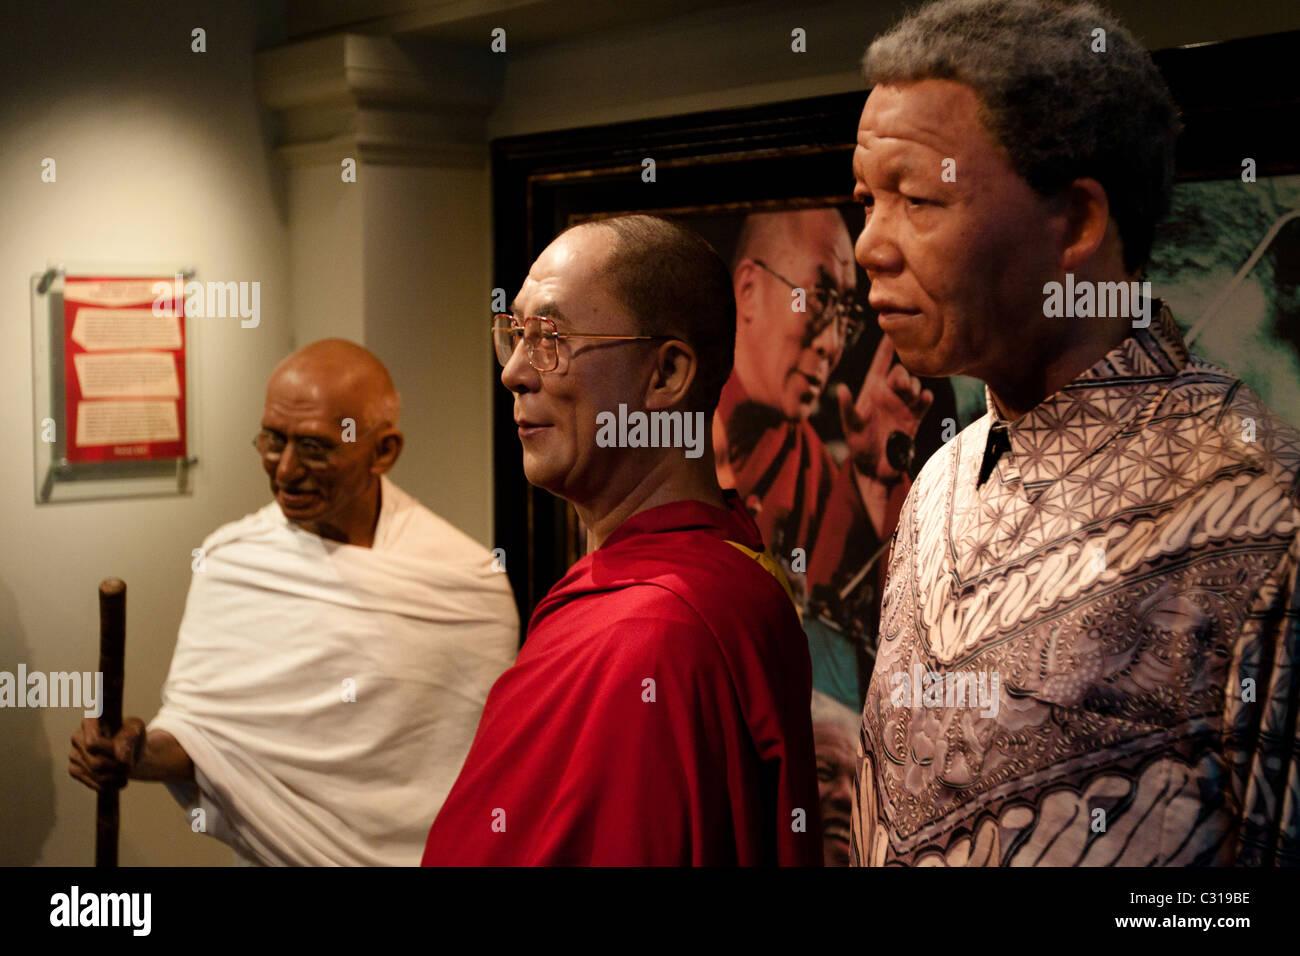 Mahatma Gandhi, Dalai Lama and Nelson Mandela in wax at the Madame Tussauds Wax Museum Amsterdam - Stock Image